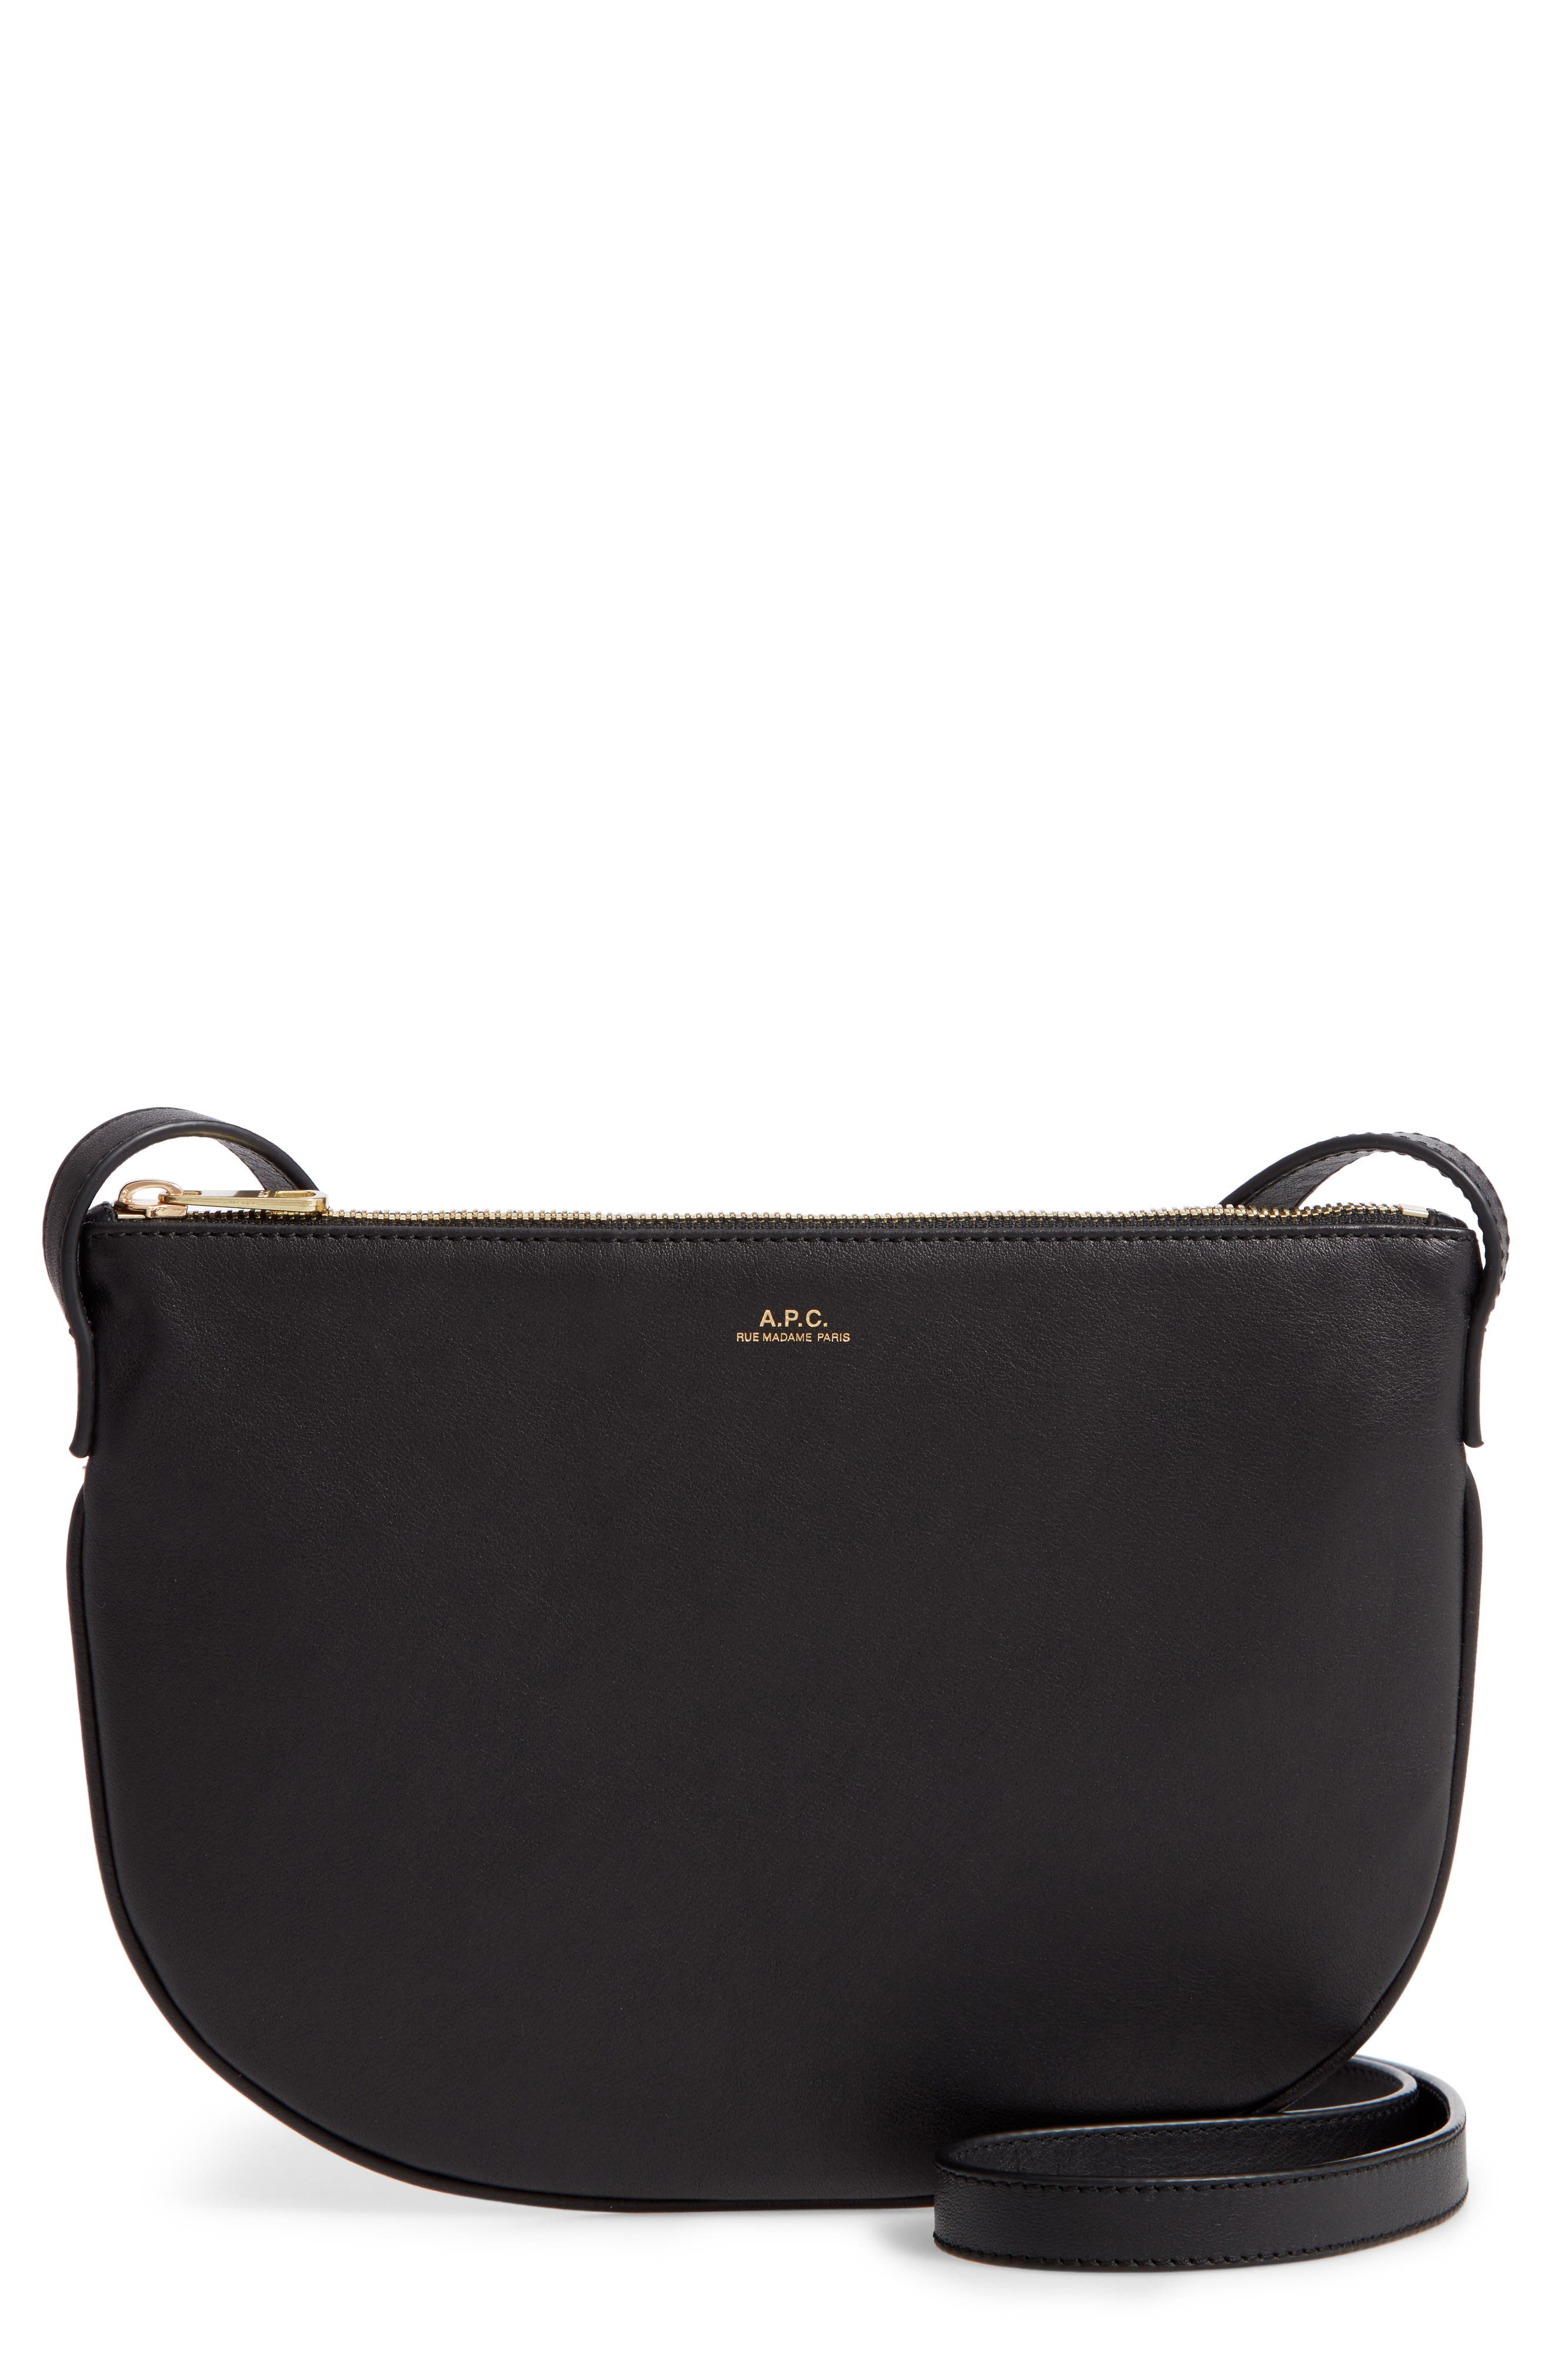 A.P.C., Sac Maelys Leather Crossbody Bag, Main thumbnail 1, color, LZZ NOIR